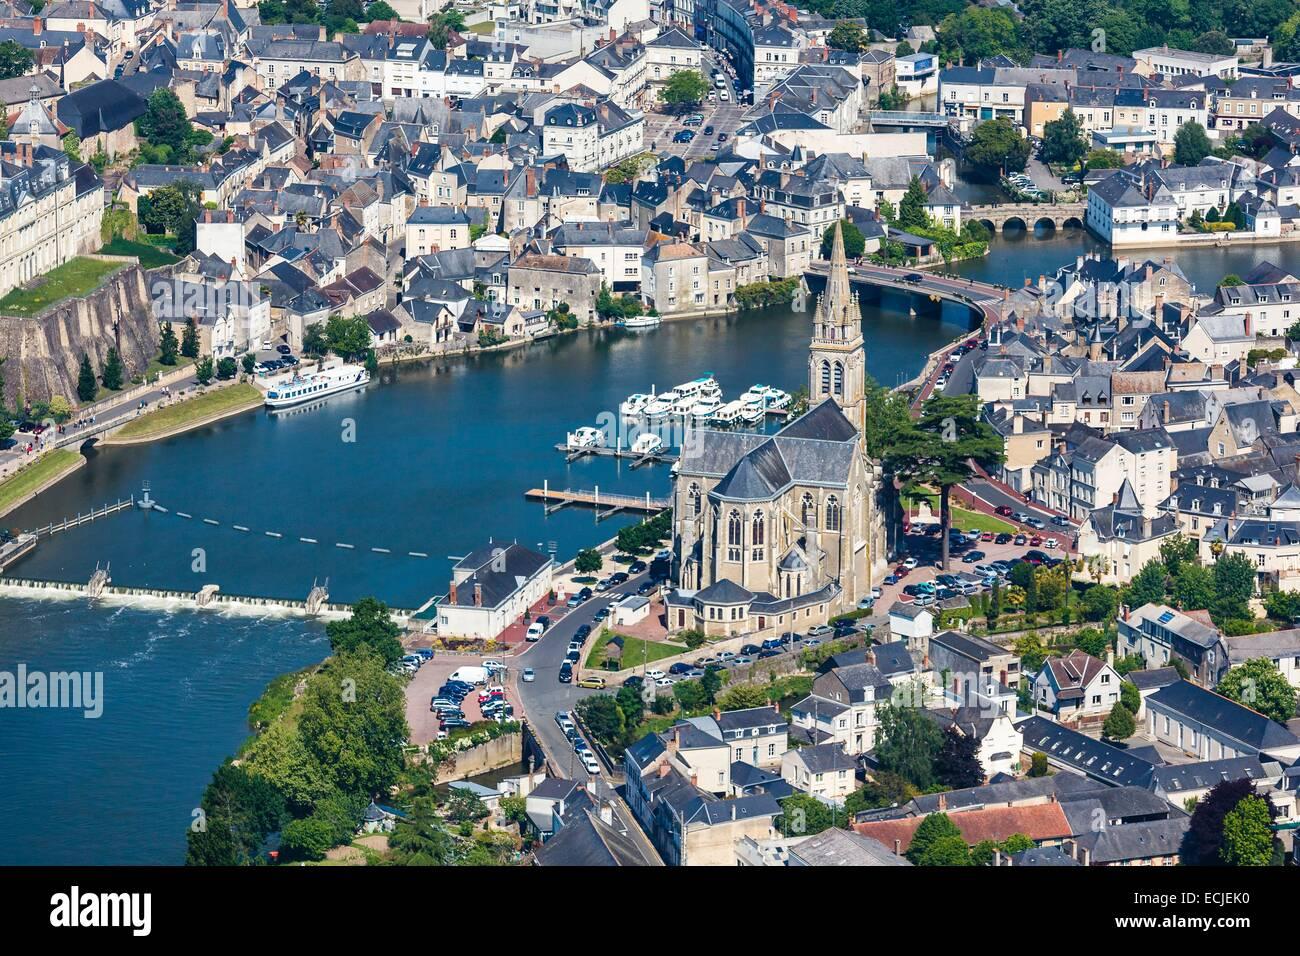 France, Sarthe, Sable sur Sarthe, the church near the Sarthe river (aerial view) - Stock Image